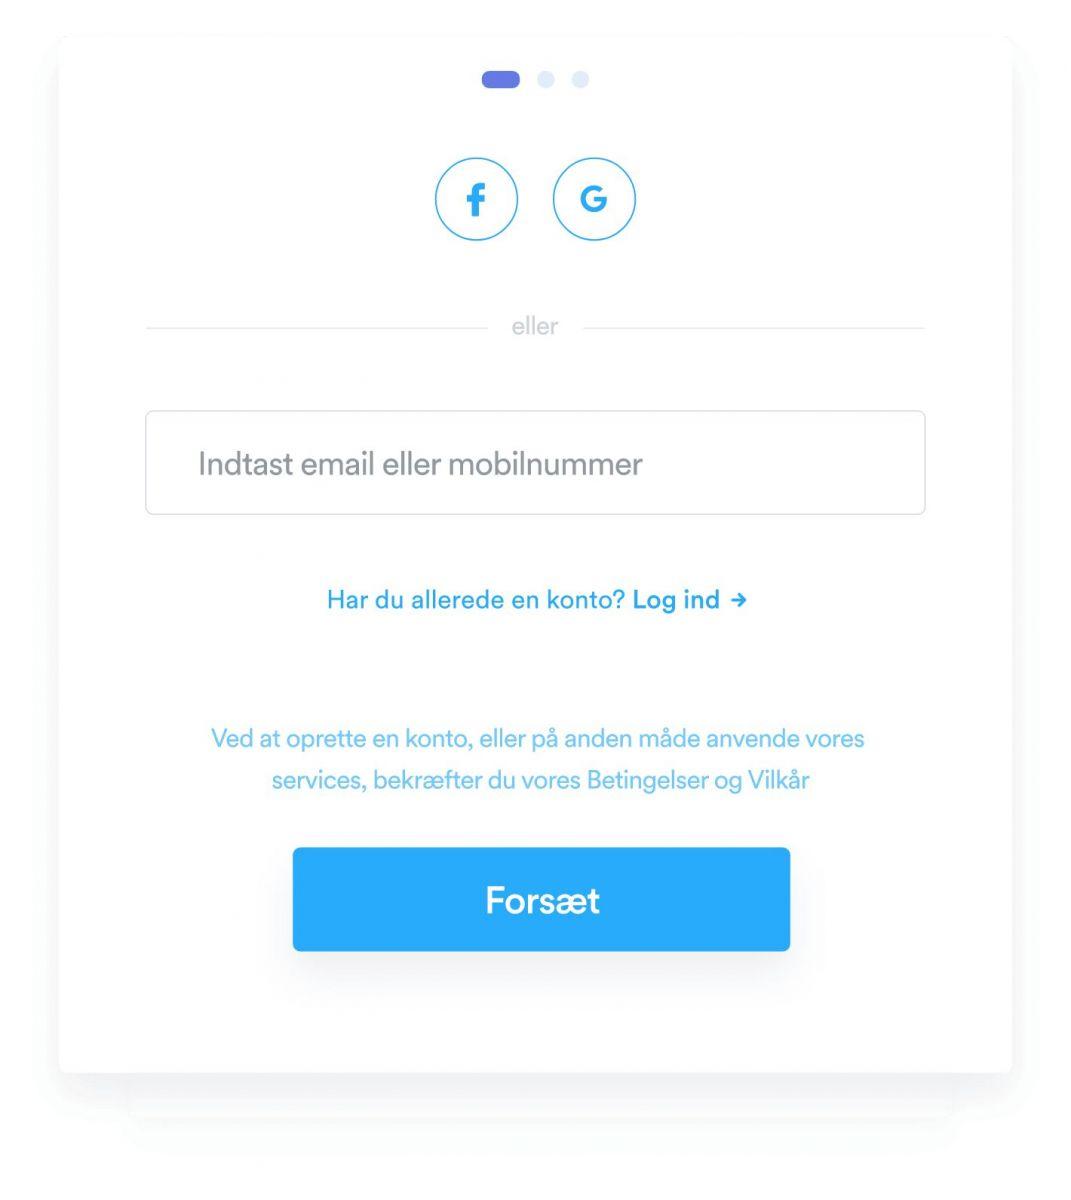 FAQ_quick_start-create_account-step_1-DK@2x